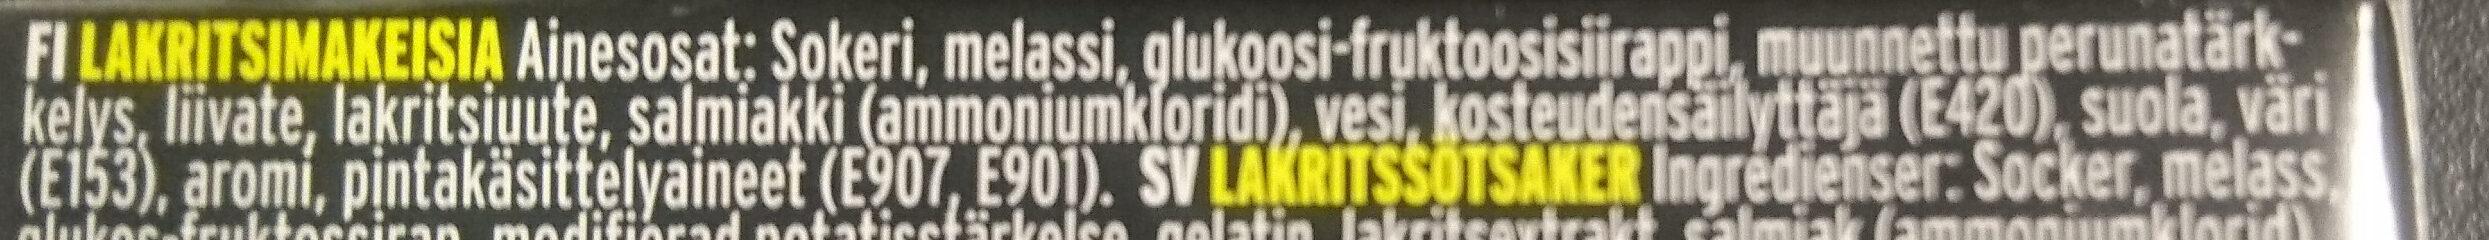 Laktritsi Pastilli - Ingredients - fi